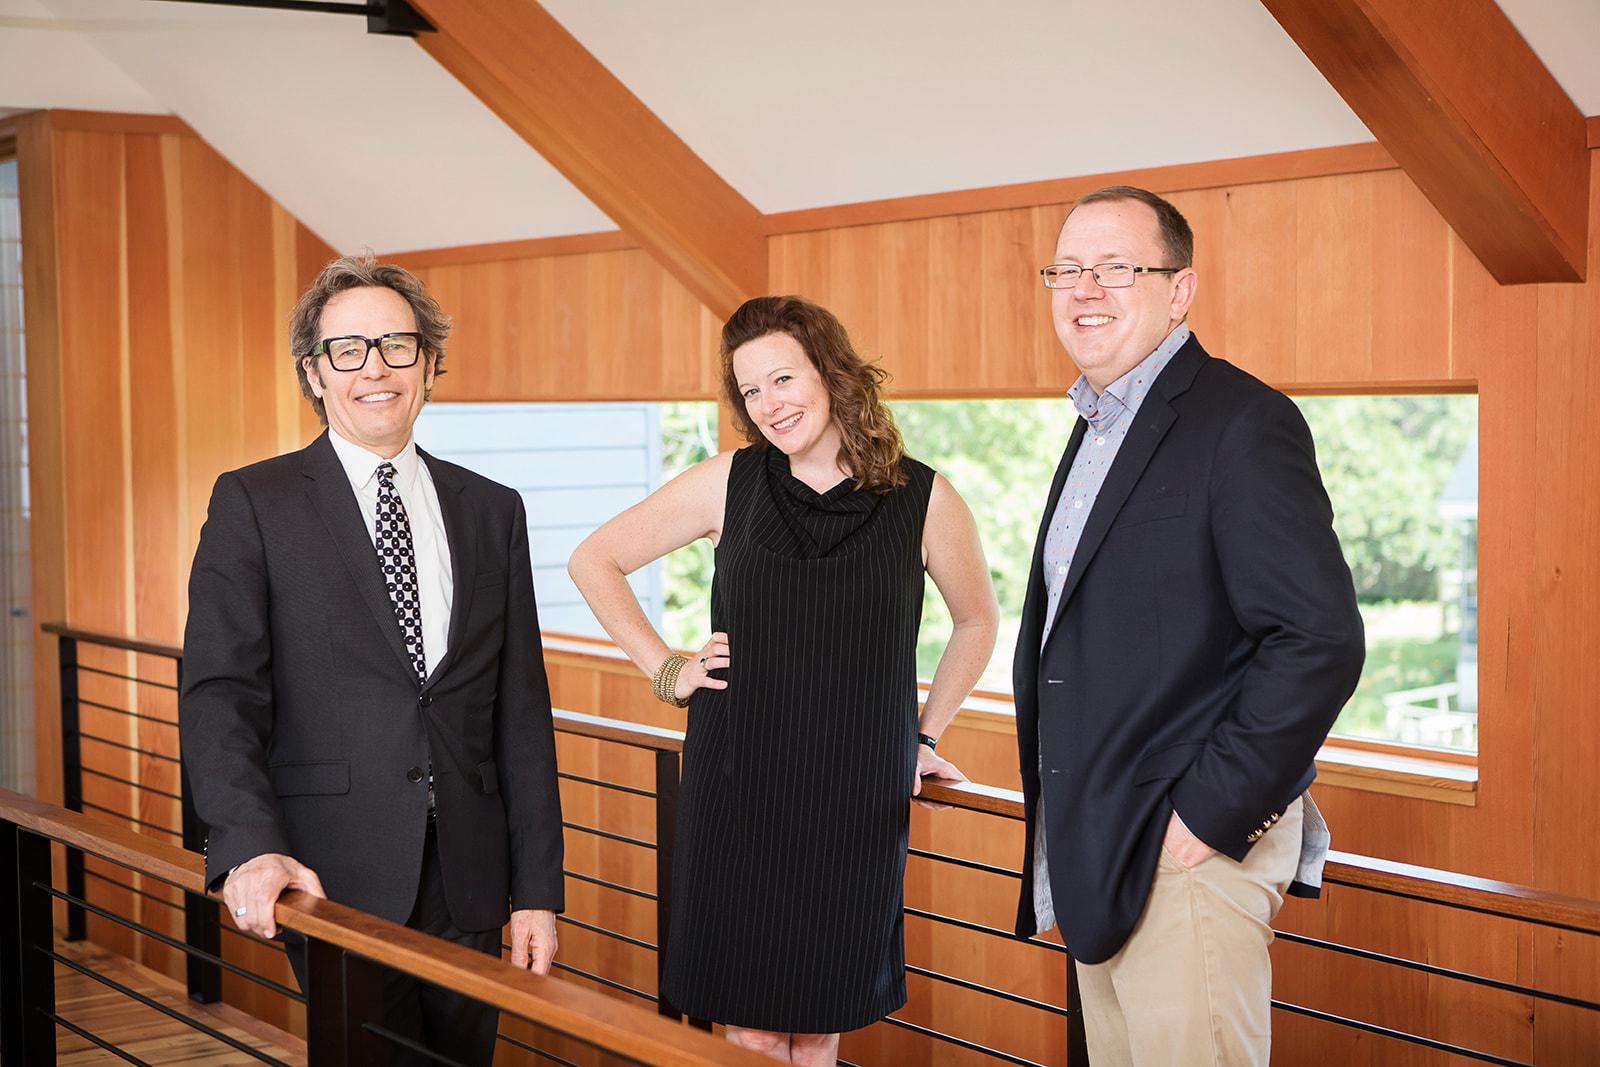 Randall Kipp, Lauren Davenport, and Keith Meberg